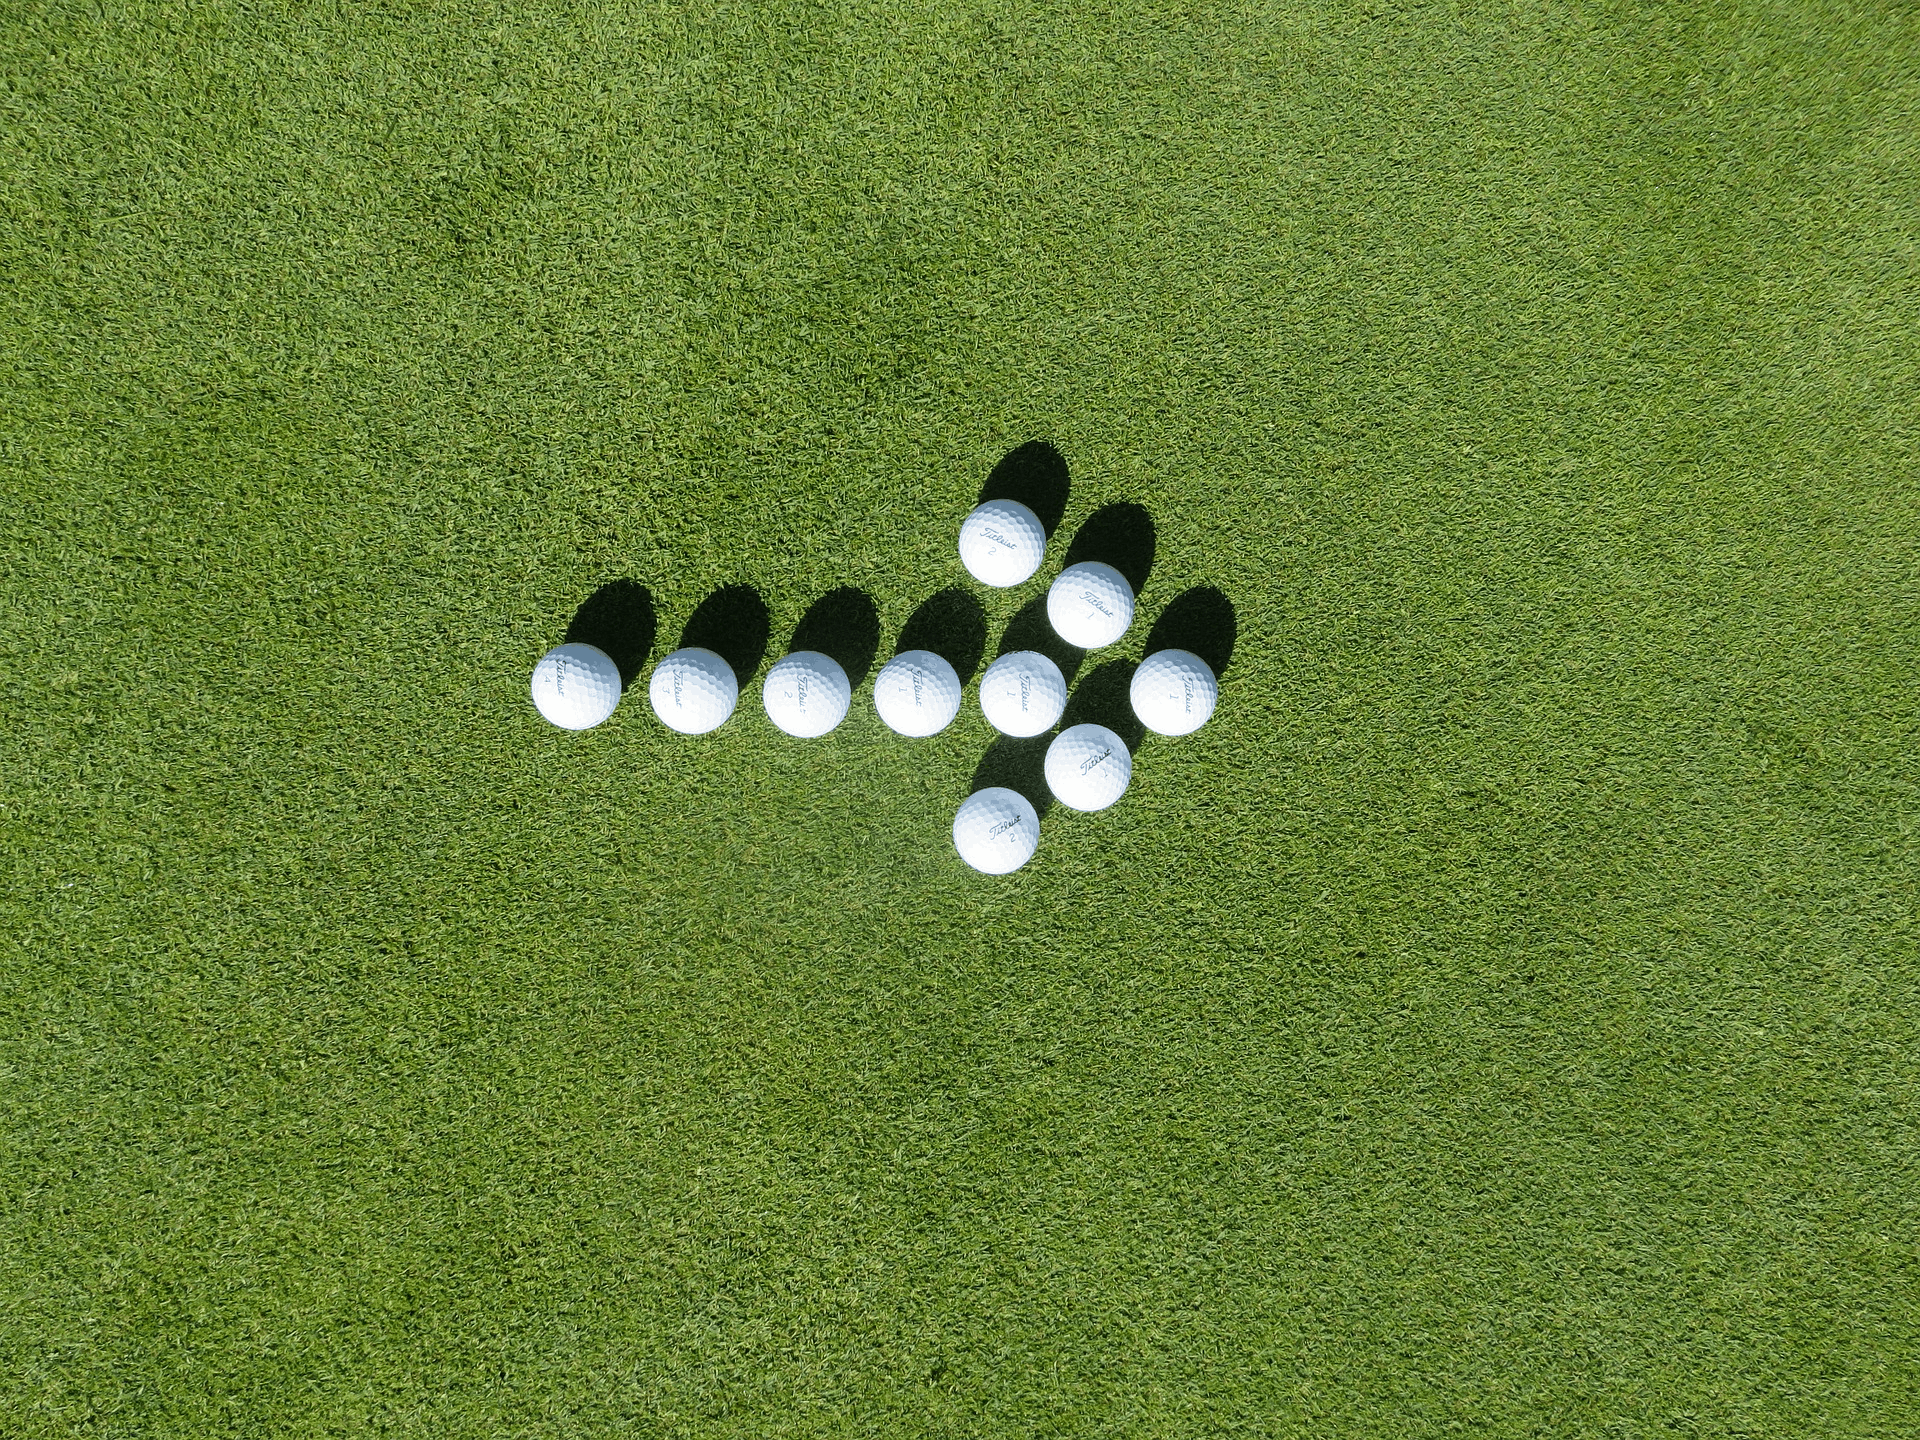 golf-549230_1920